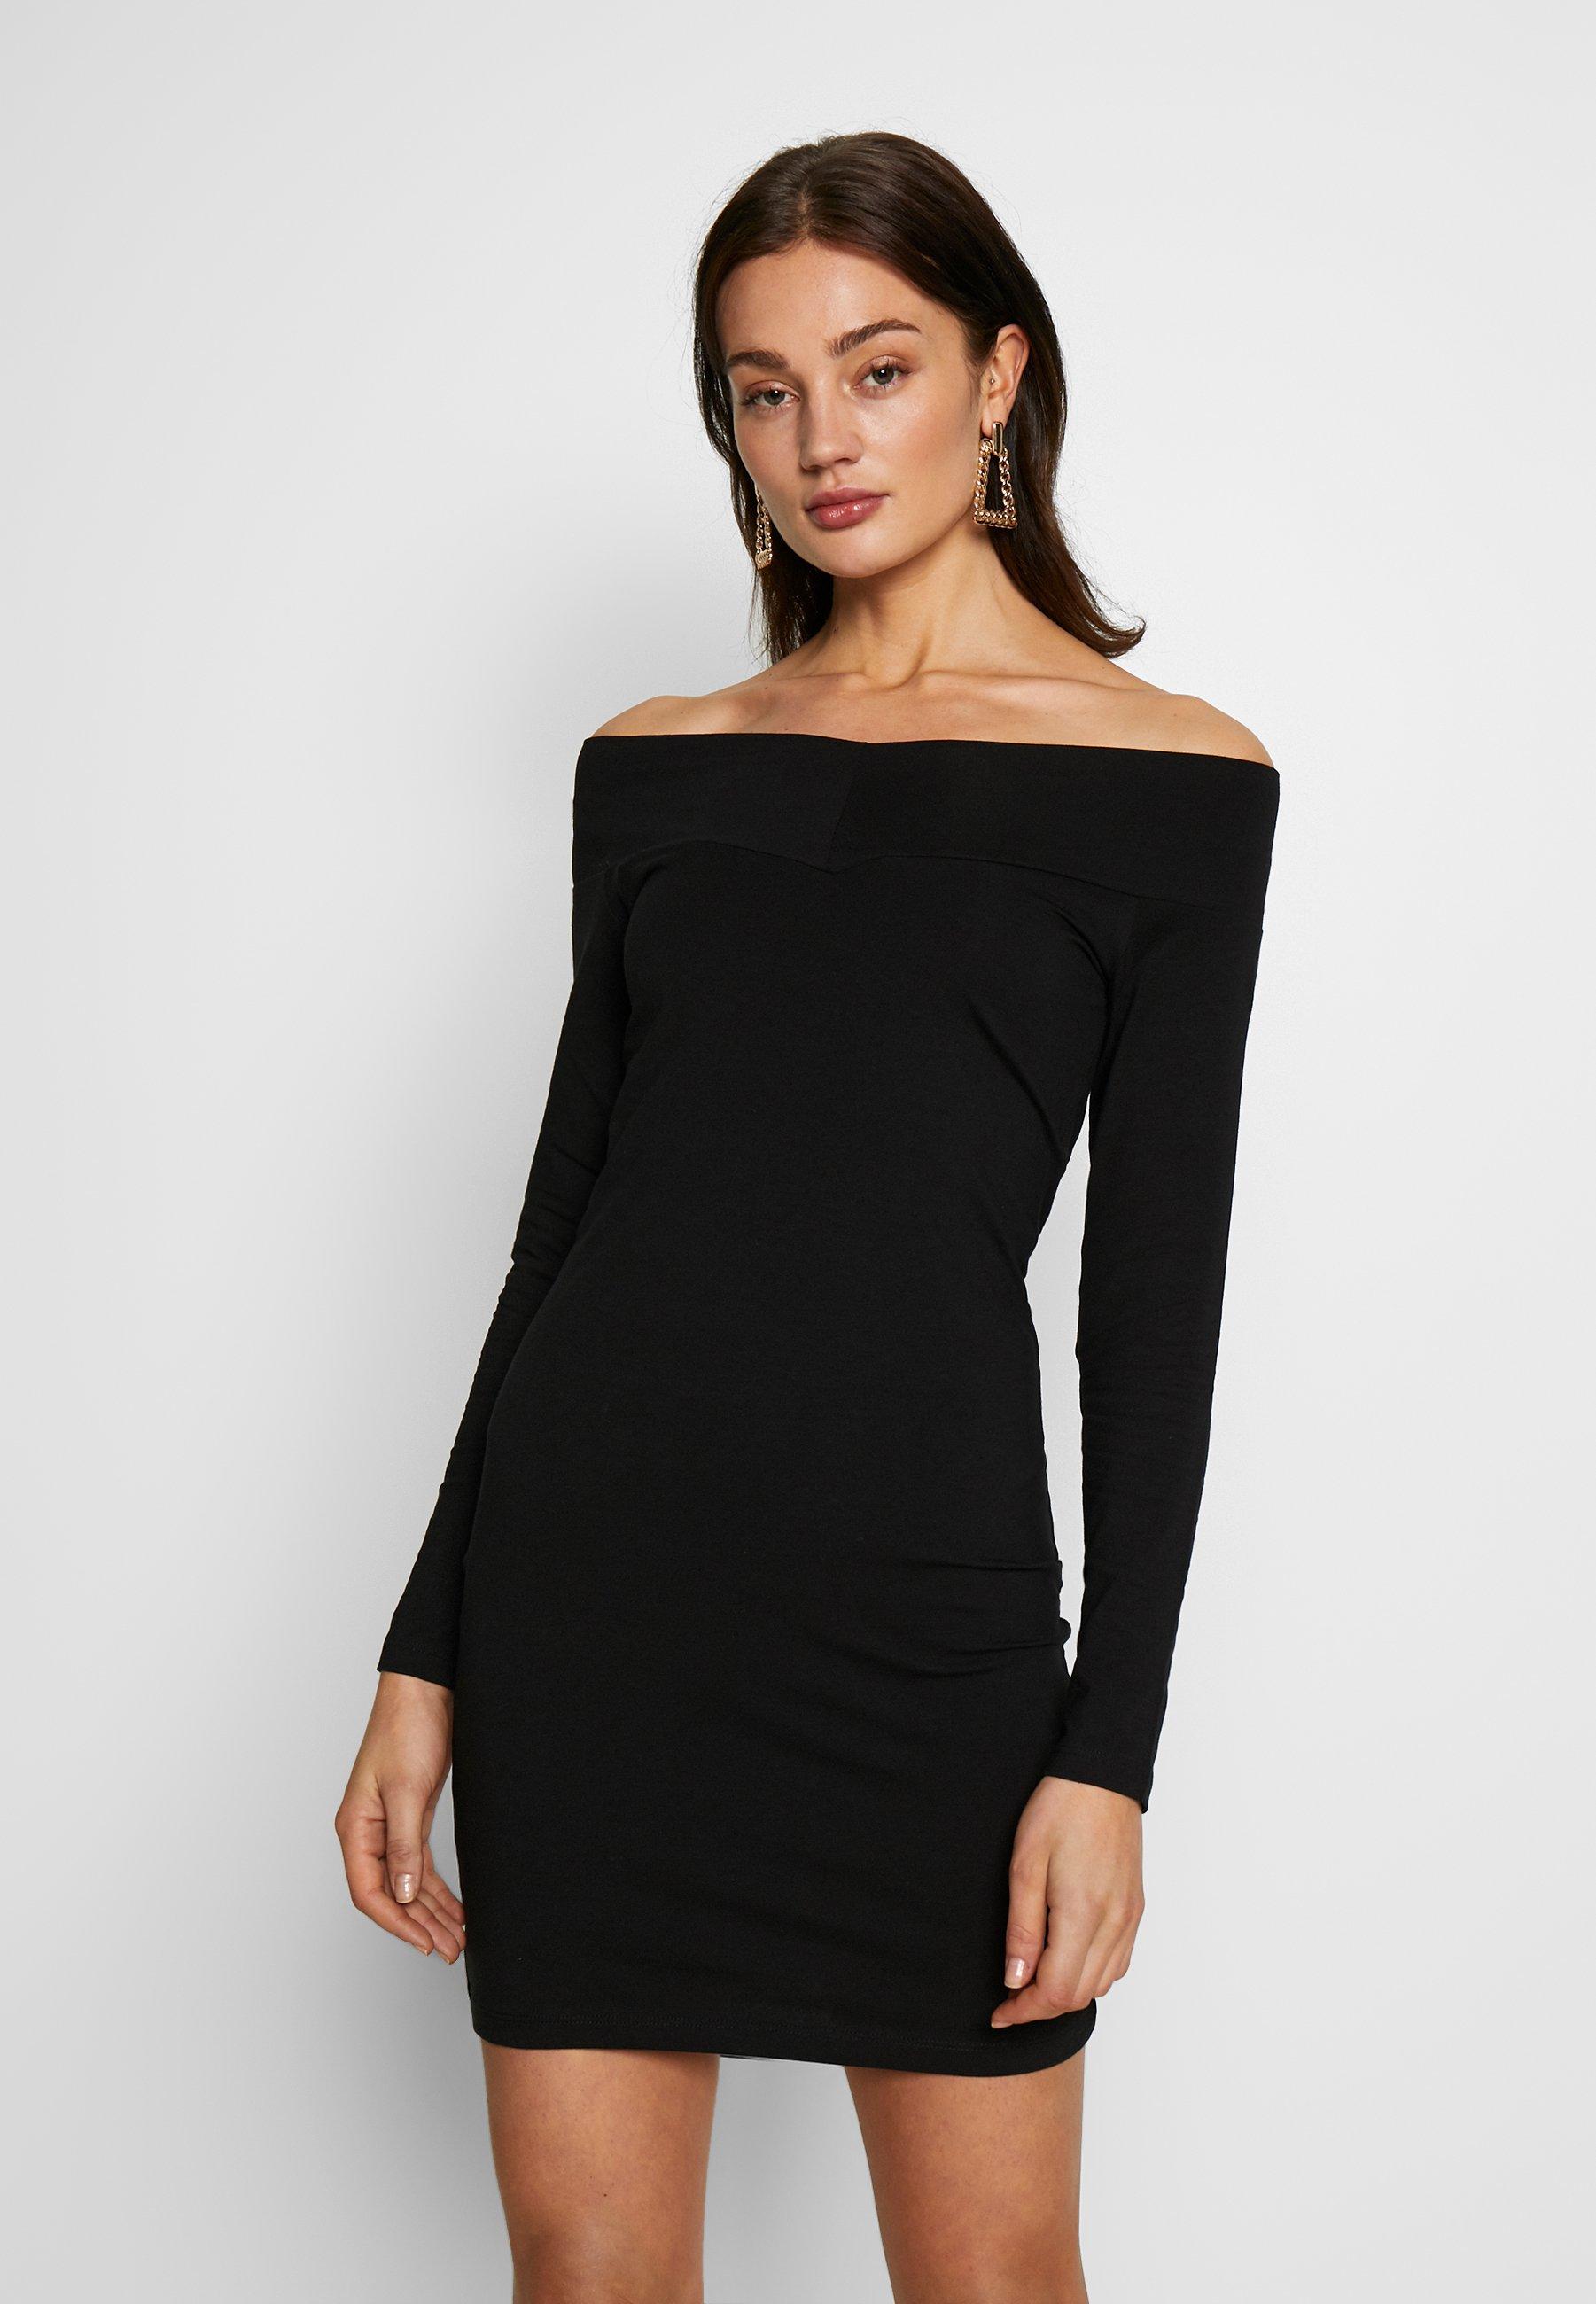 Mujer BASIC - OFF-SHOULDER MINI LONG SLEEVES DRESS - Vestido de tubo